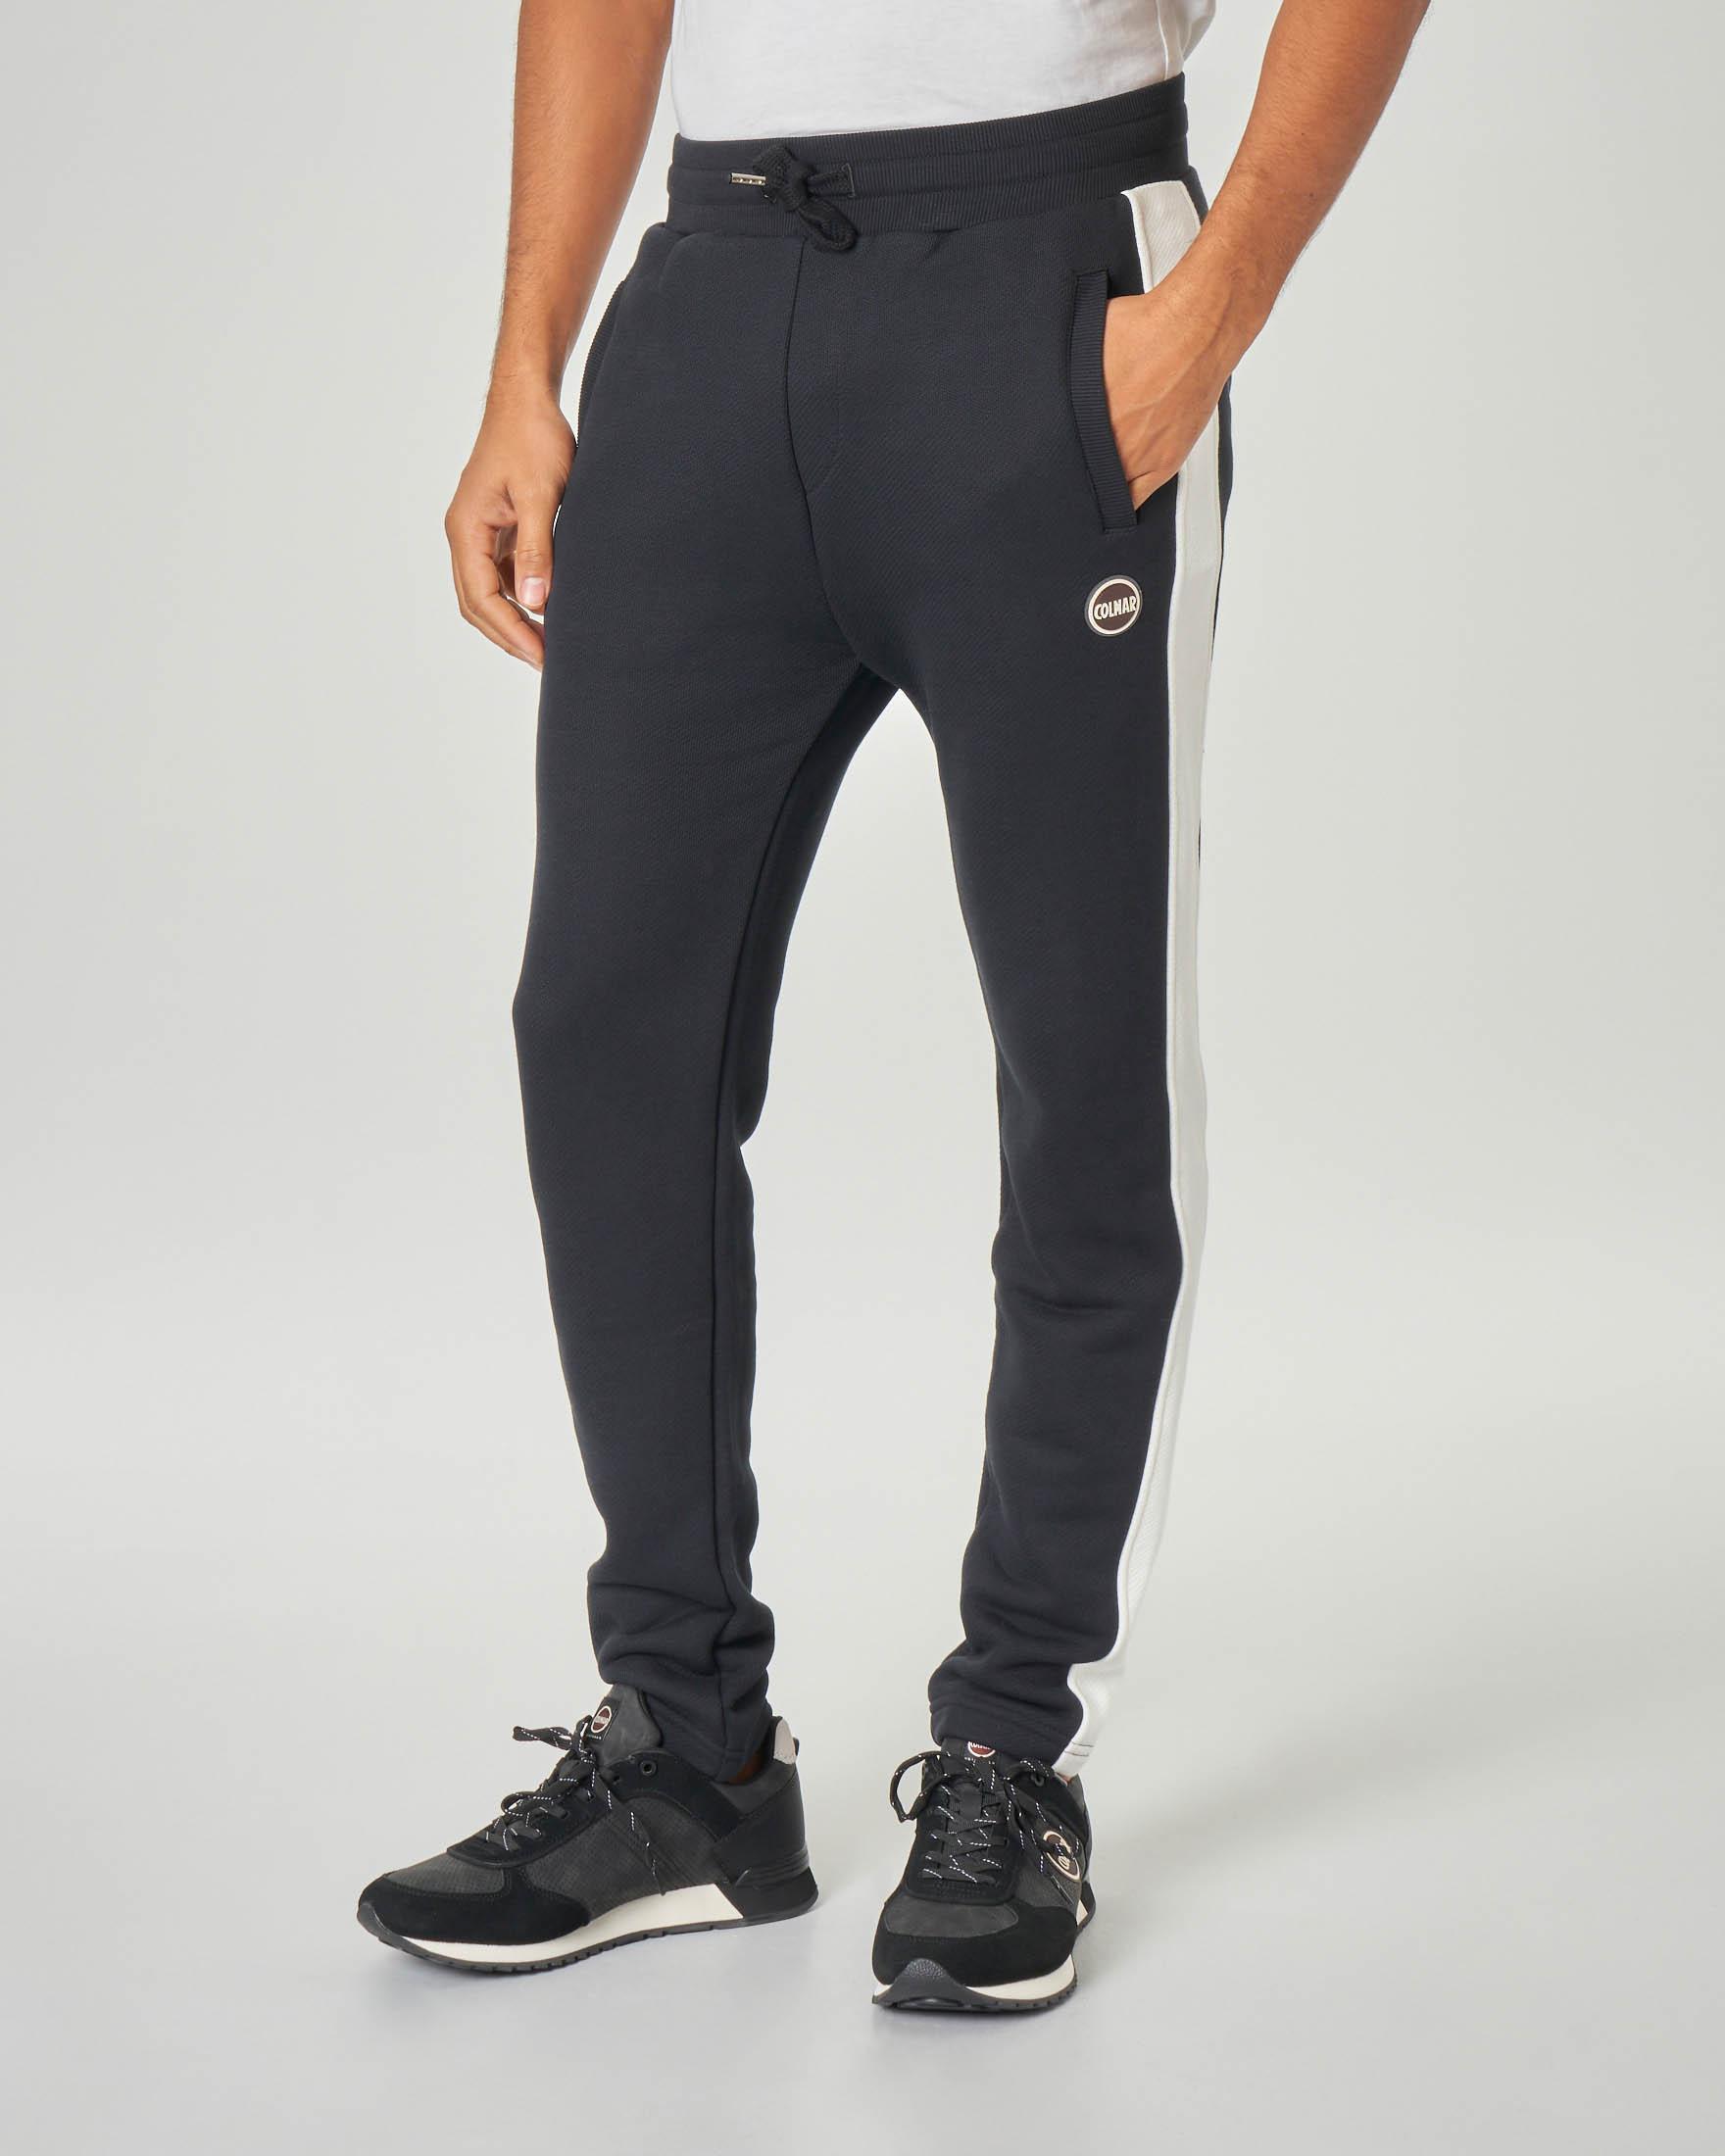 Pantalone nero in felpa garzata con bande a contrasto